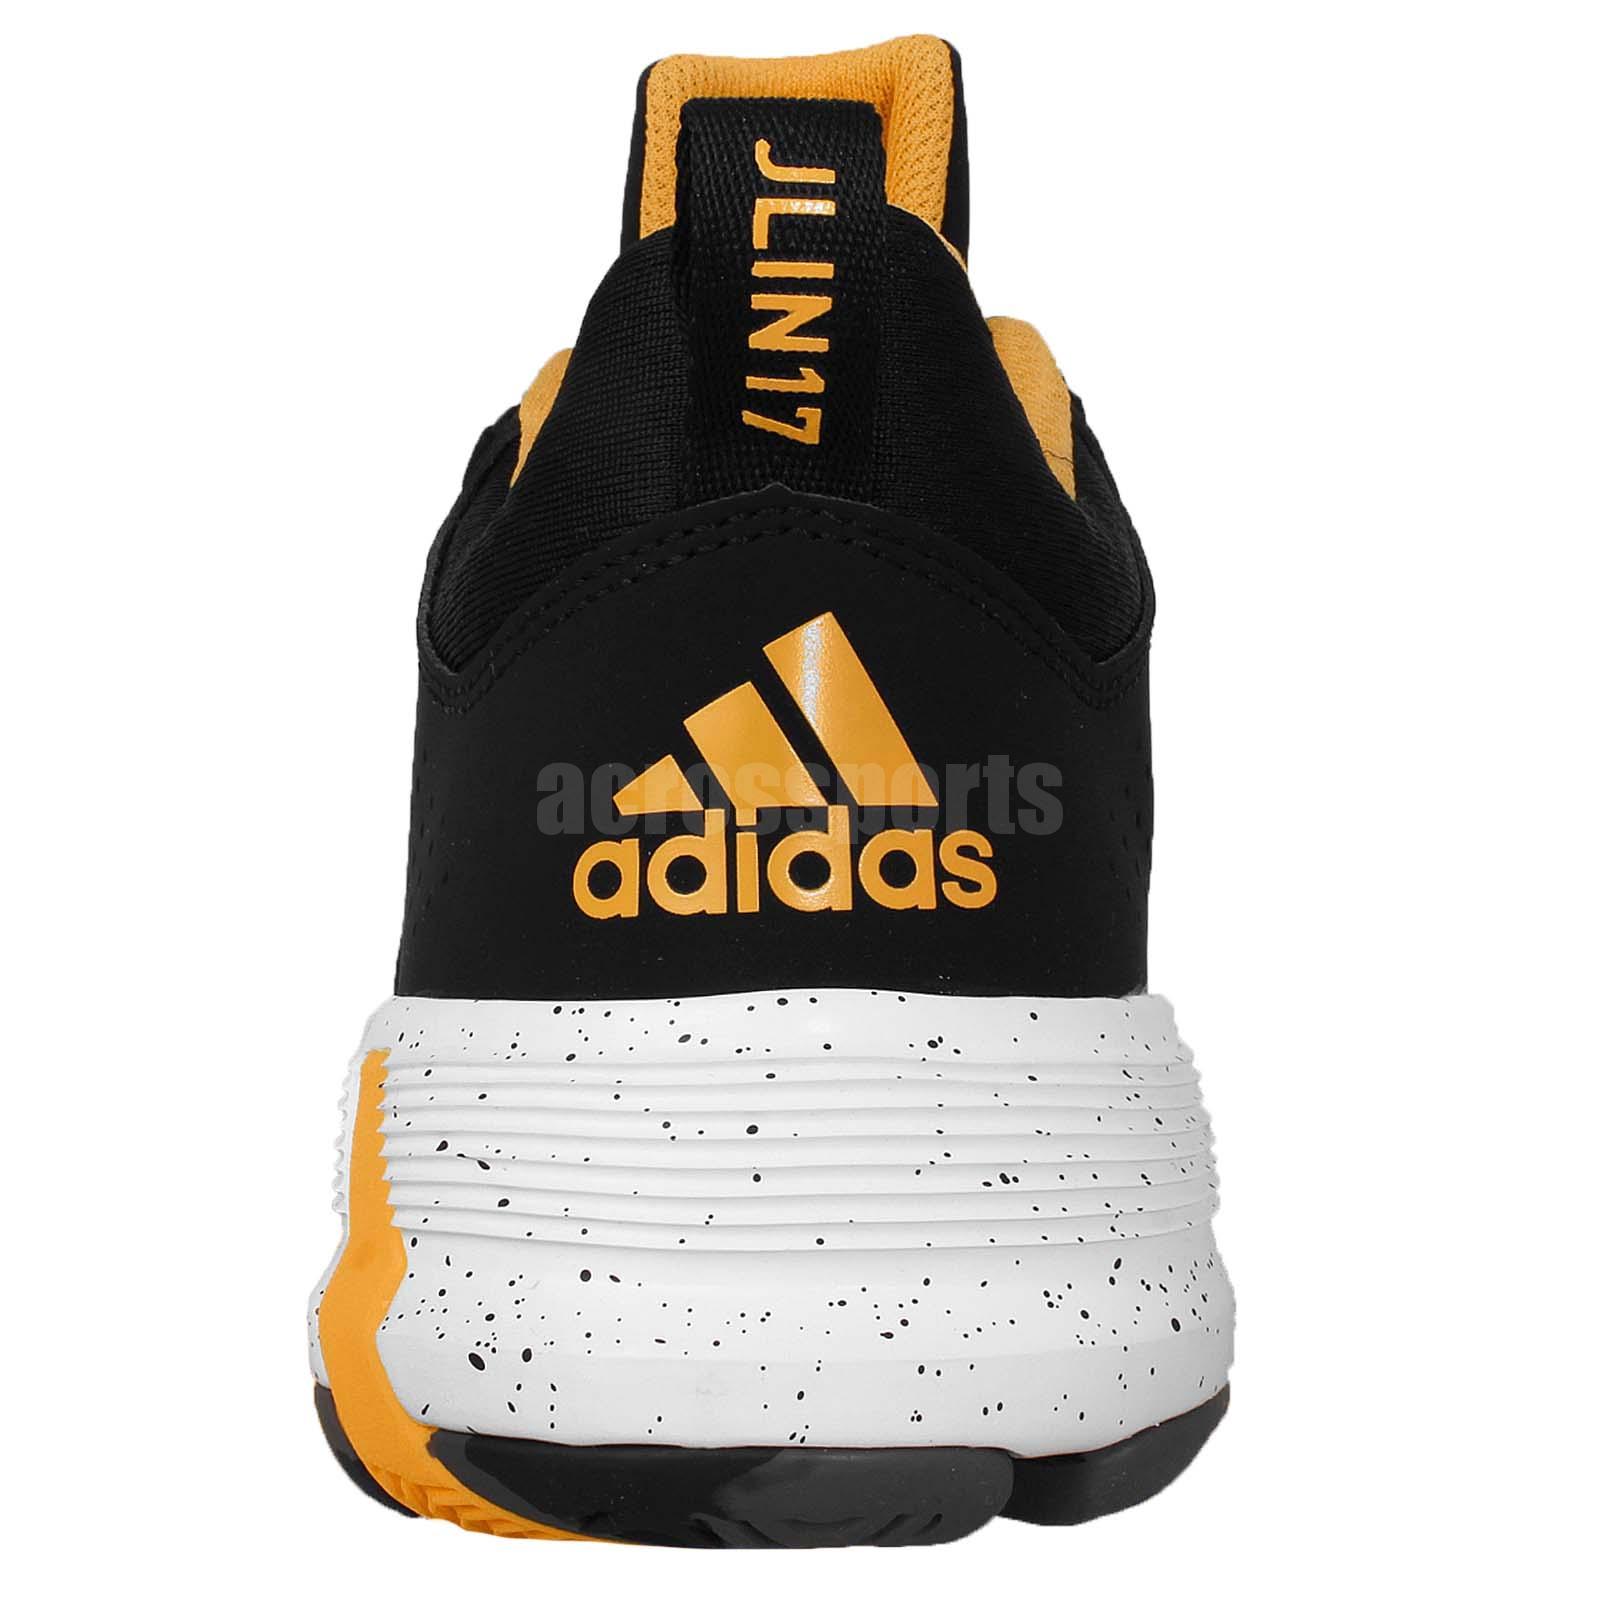 Adidas Crazyquick Street Black Gold 2015 Mens Basketball Shoes Sneakers    eBay